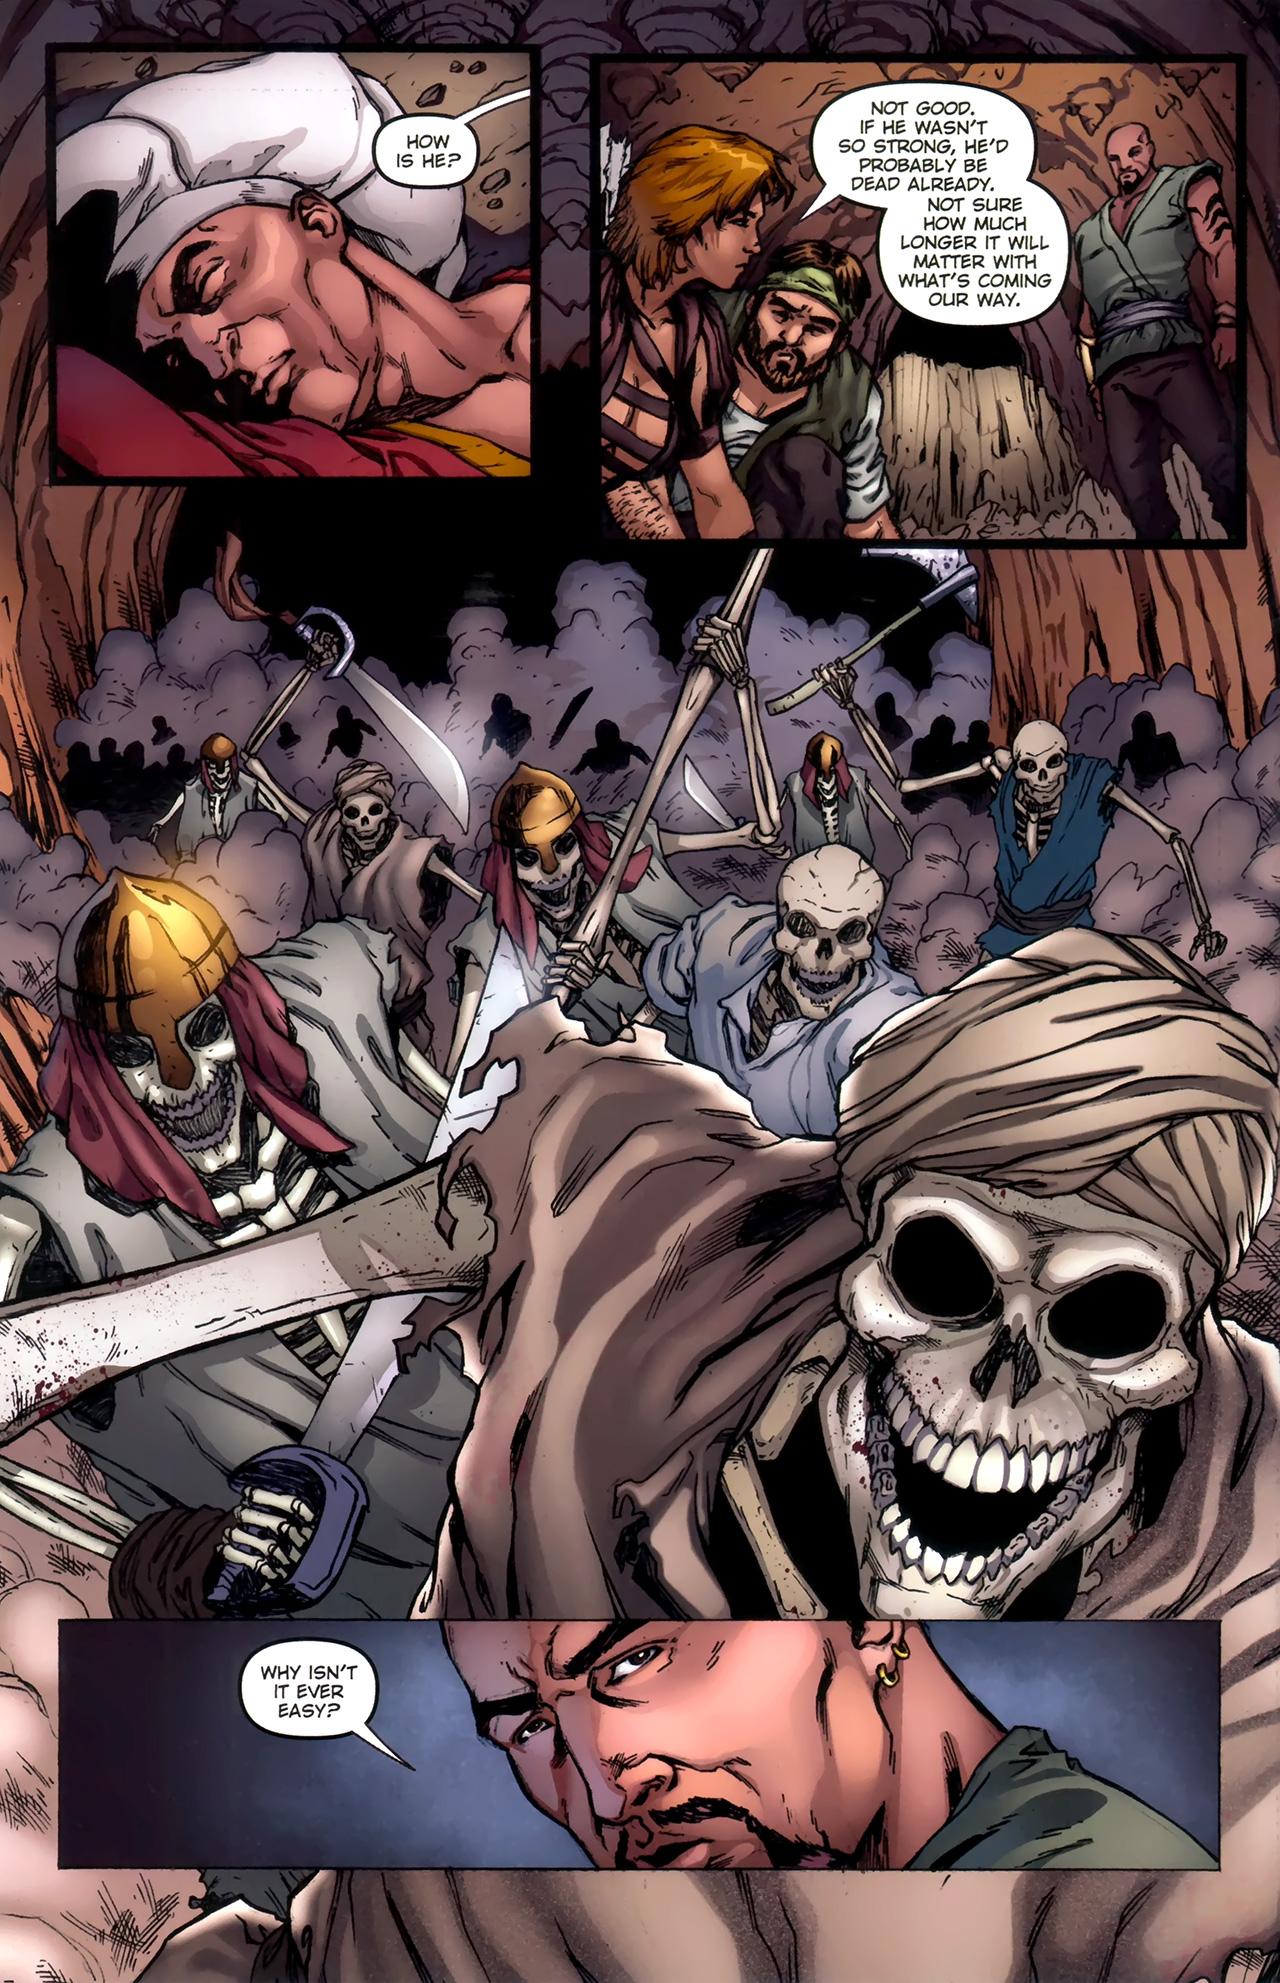 Read online 1001 Arabian Nights: The Adventures of Sinbad comic -  Issue #11 - 6